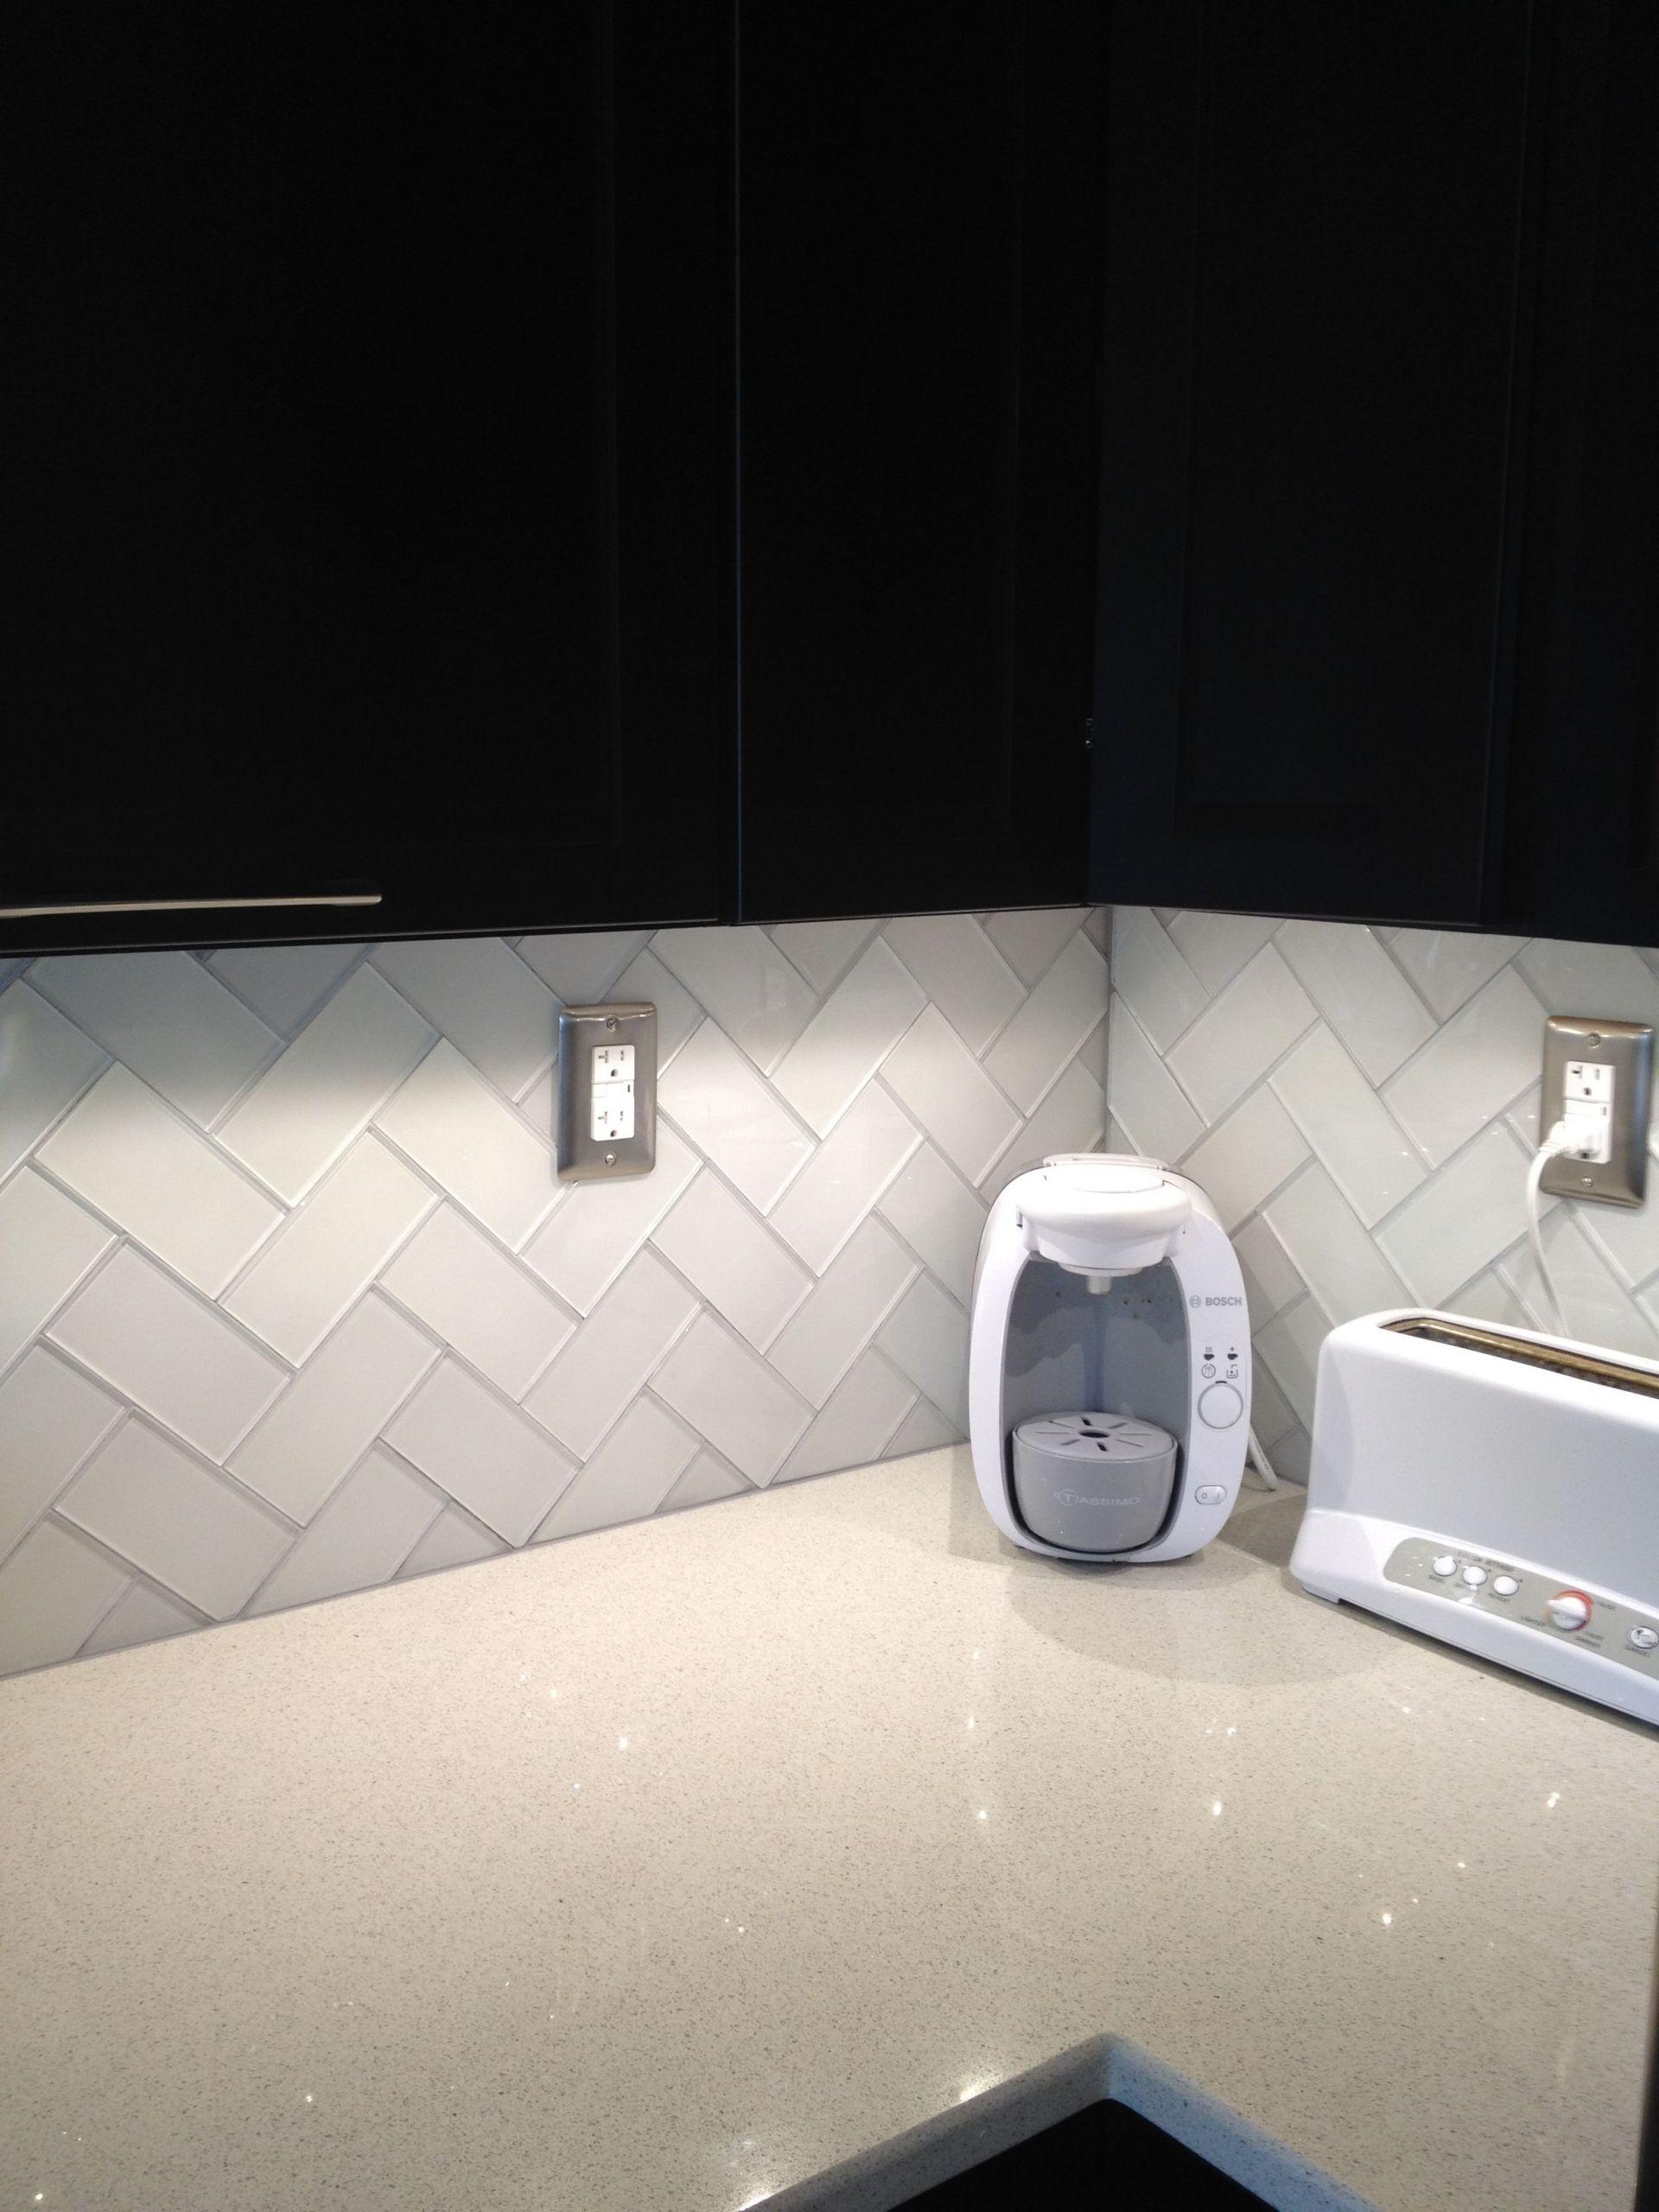 Herringbone Backsplash Subway Tile New Herringbone Pattern White Glass Subway Tile Added Delorean